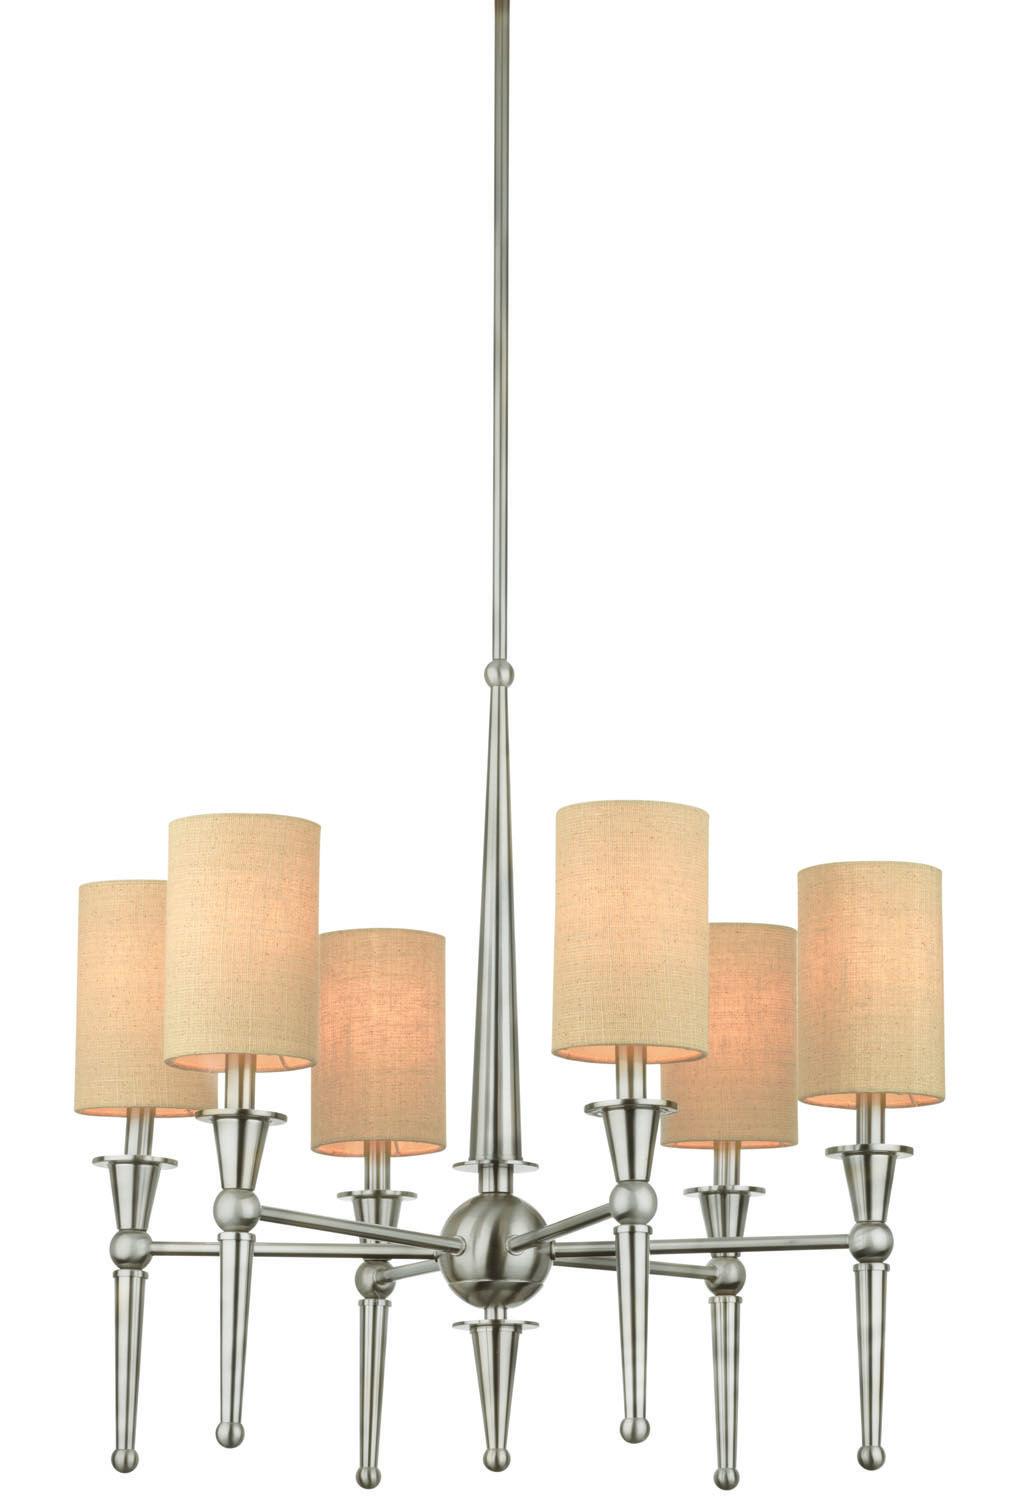 Michigan chandelier kitchen chandeliers pinterest kitchen kitchens michigan chandelier arubaitofo Images